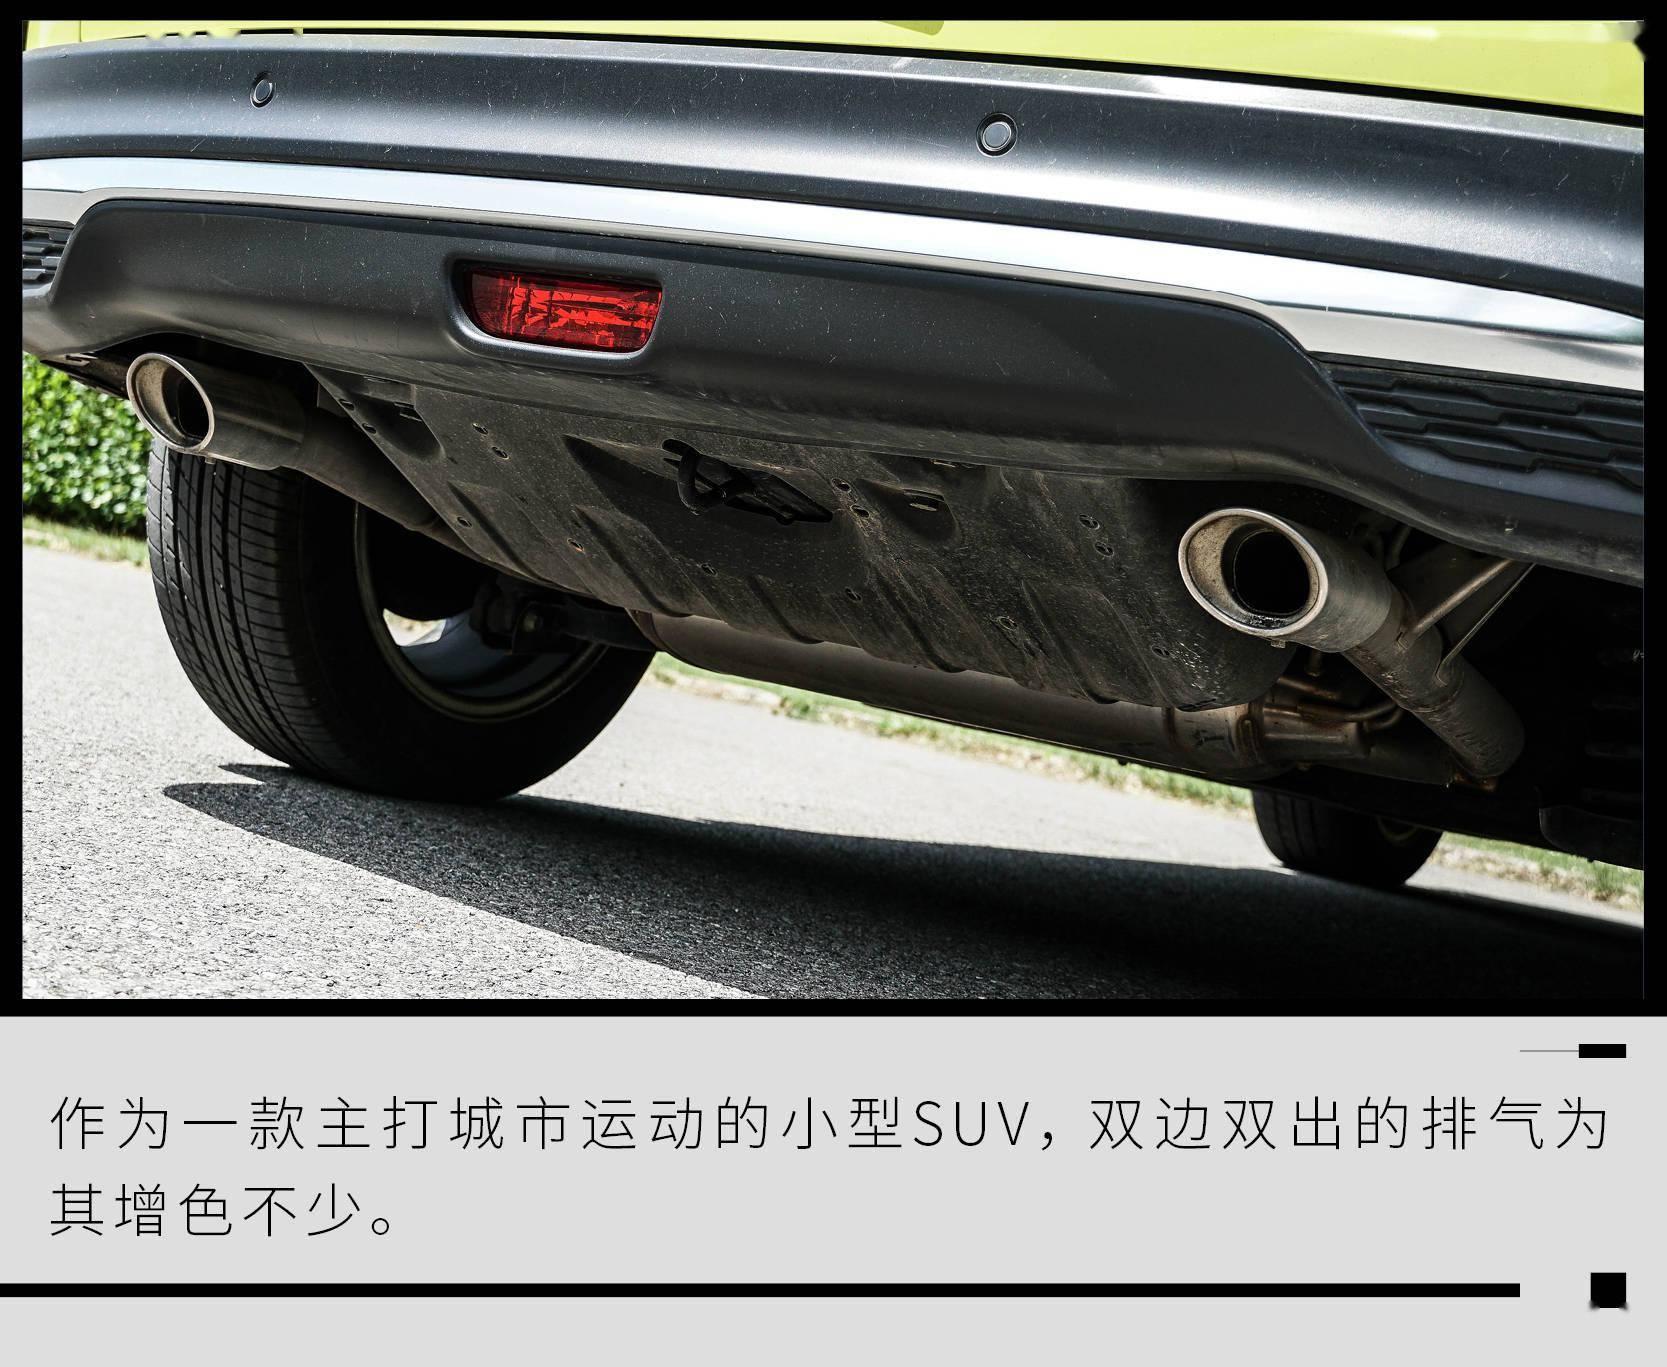 更精緻 更實用 更好開 測東風本田XR-V